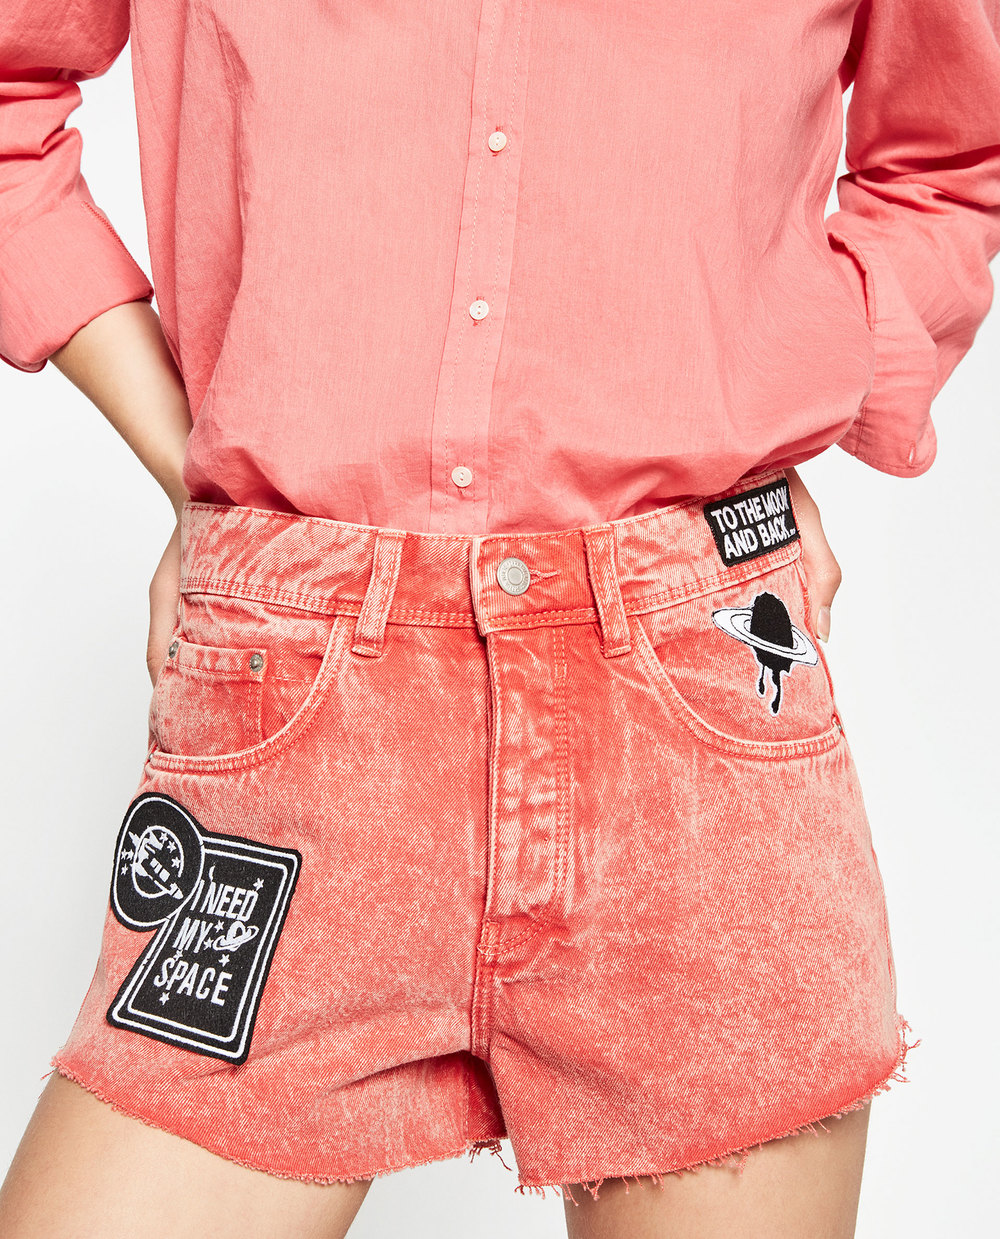 zara shorts.jpg